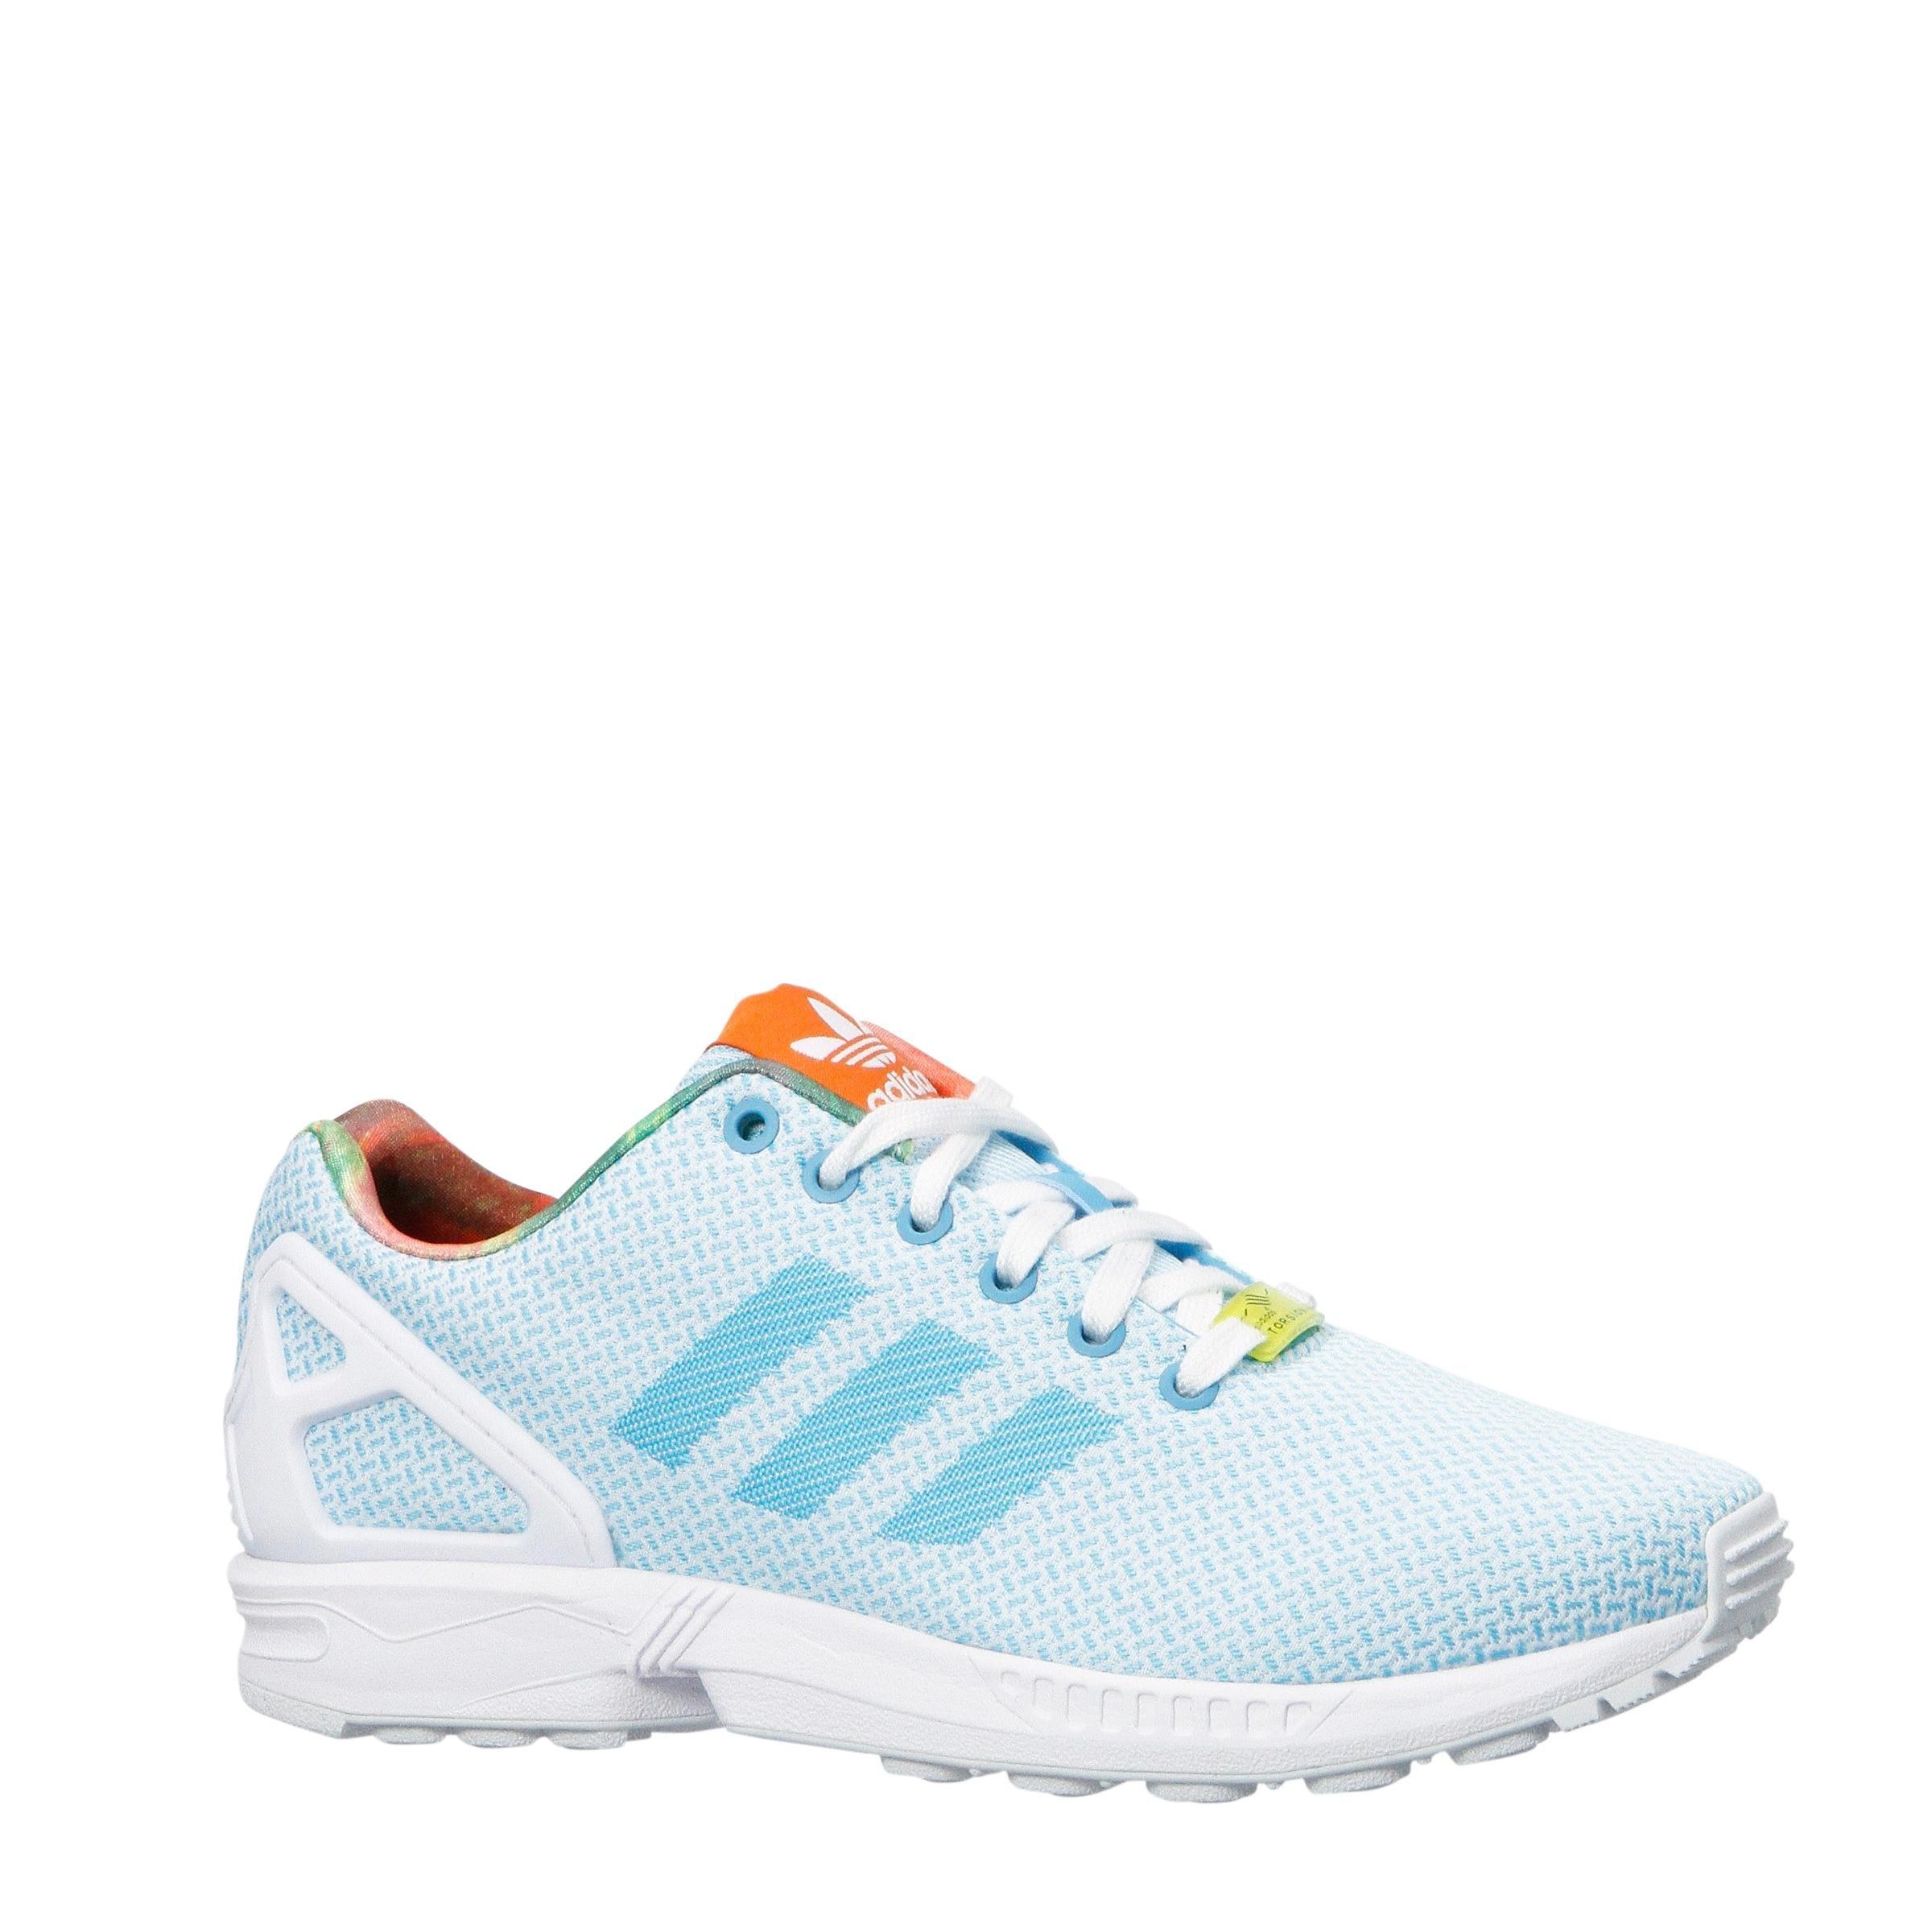 Adidas Flux W Fraaie Zx Weave blauwwit Originals Sneakers A1Iqdx4q